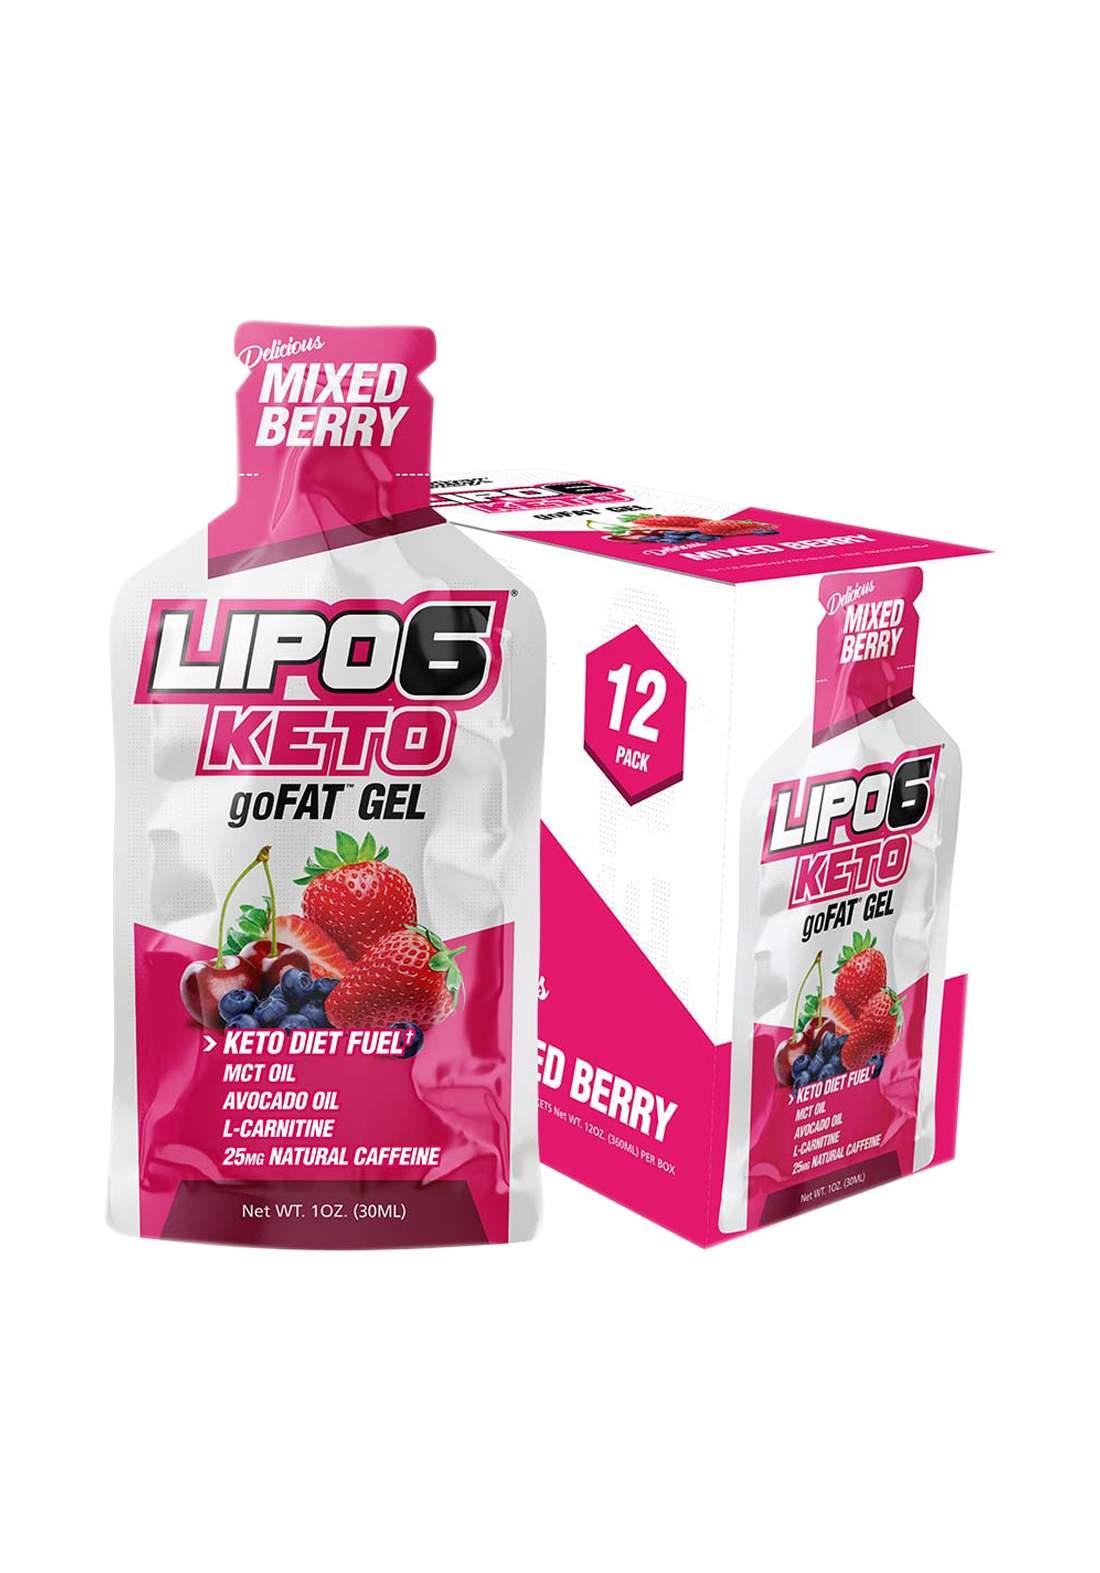 Nutrex Lipo-6 Keto go  Energy Gels for Low Carb Athletes Mixed Berry 12 Pcs جل طاقة منخفض الكارب